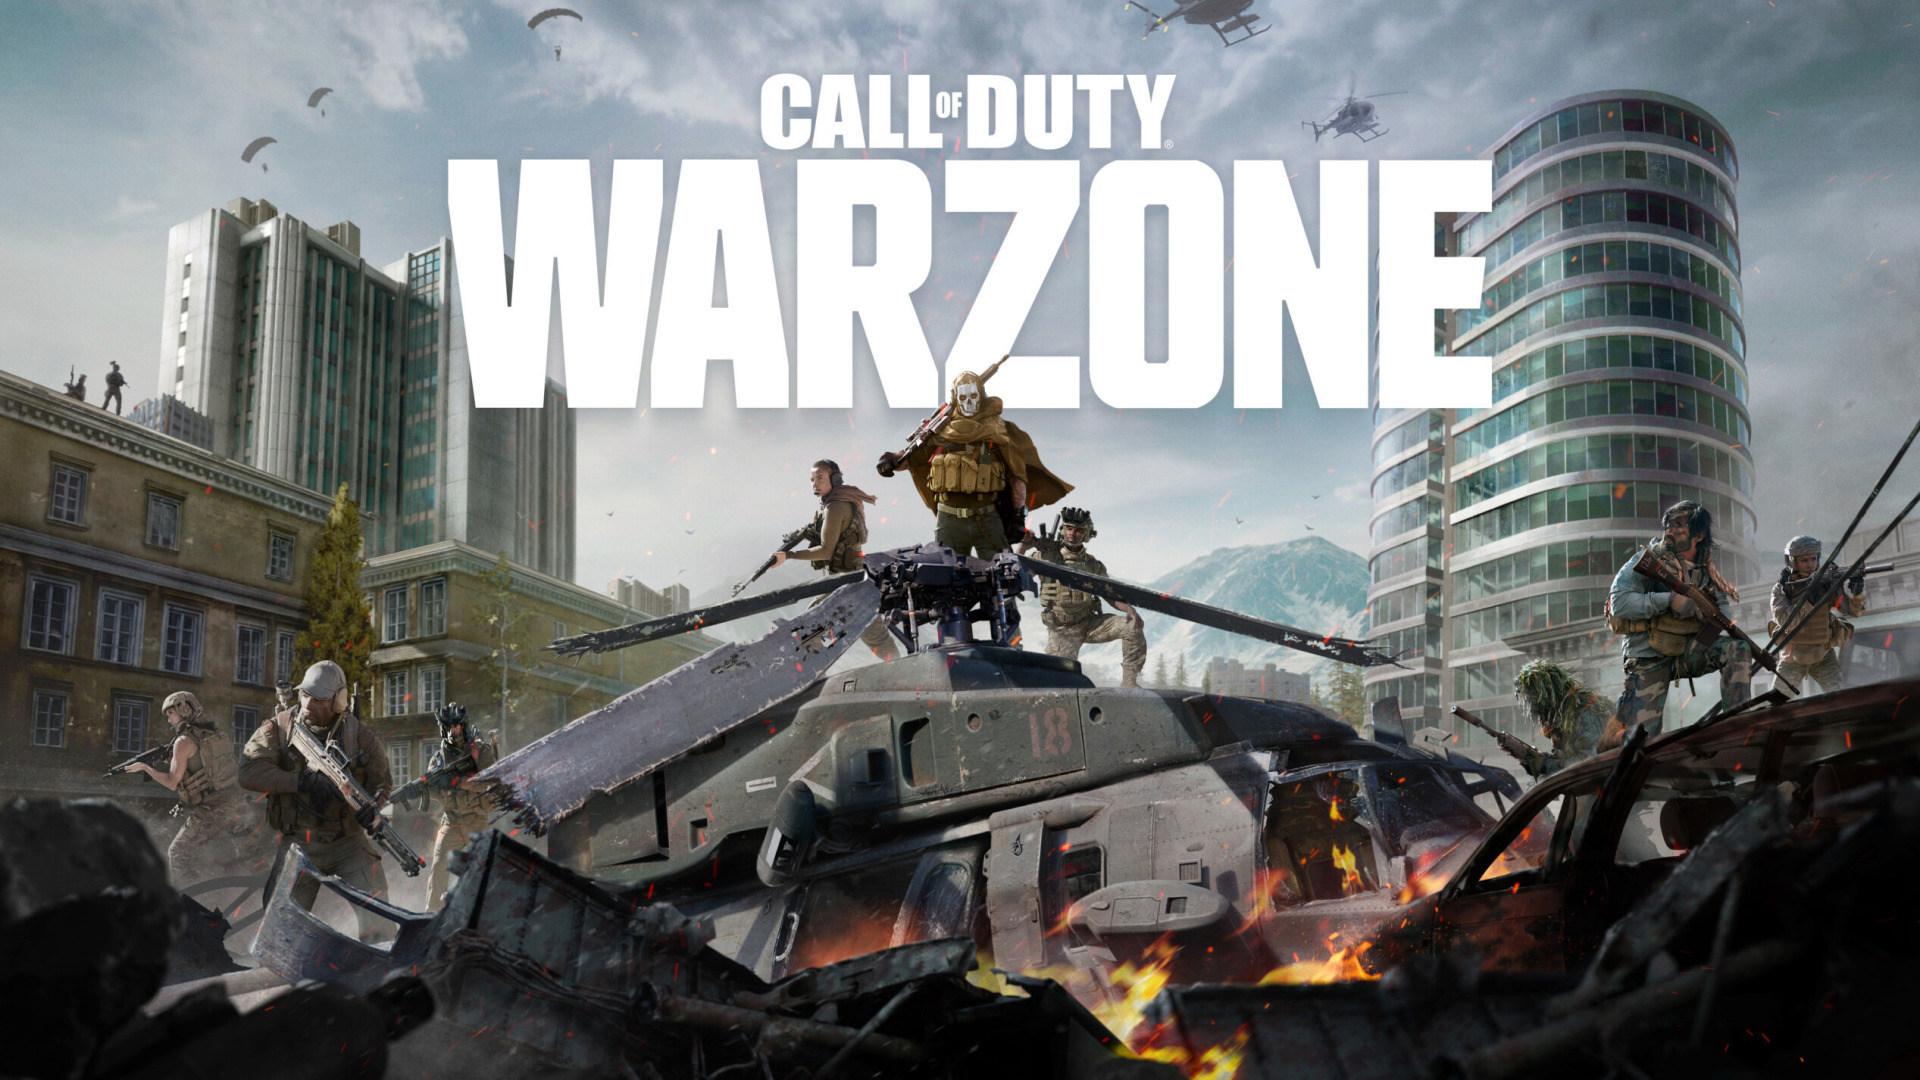 Call of Duty, Warzone, Call of Duty: Warzone